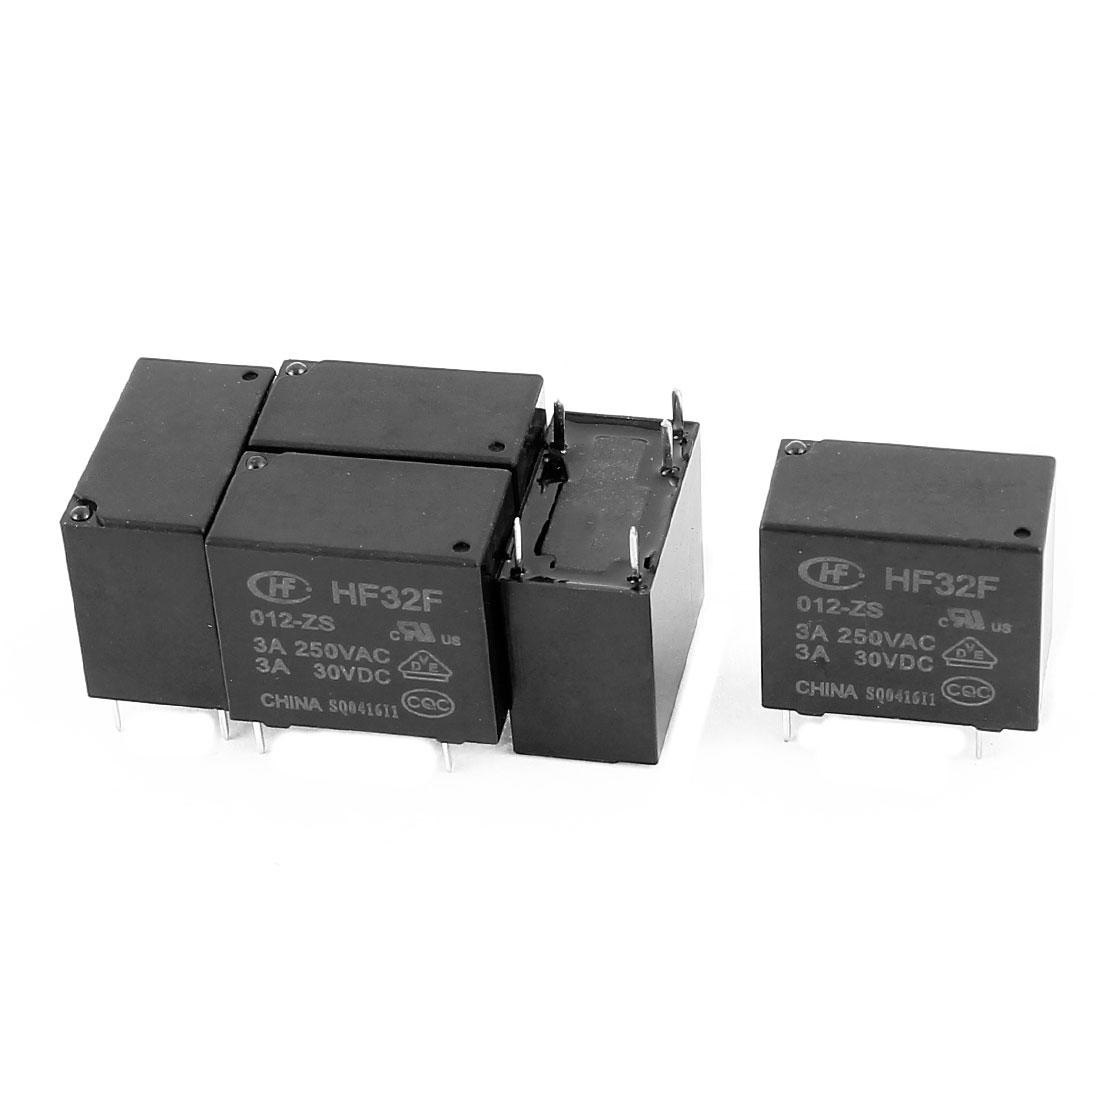 5 Pcs 30VDC 250VAC 3A 5 Terminal SPDT Conversion HF32F-012-ZS Power Relay